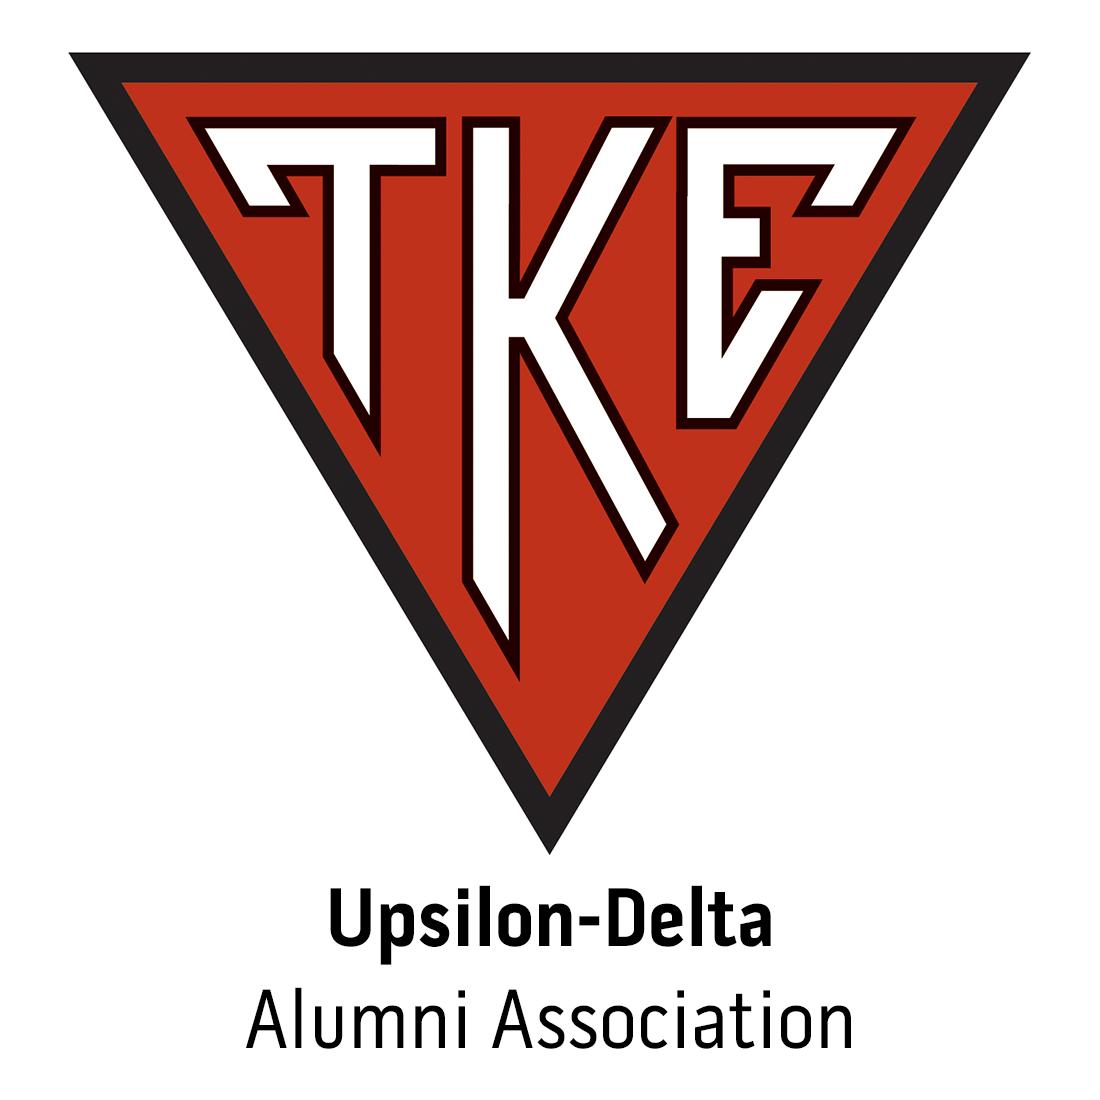 Upsilon-Delta Alumni Association at Saginaw Valley State University